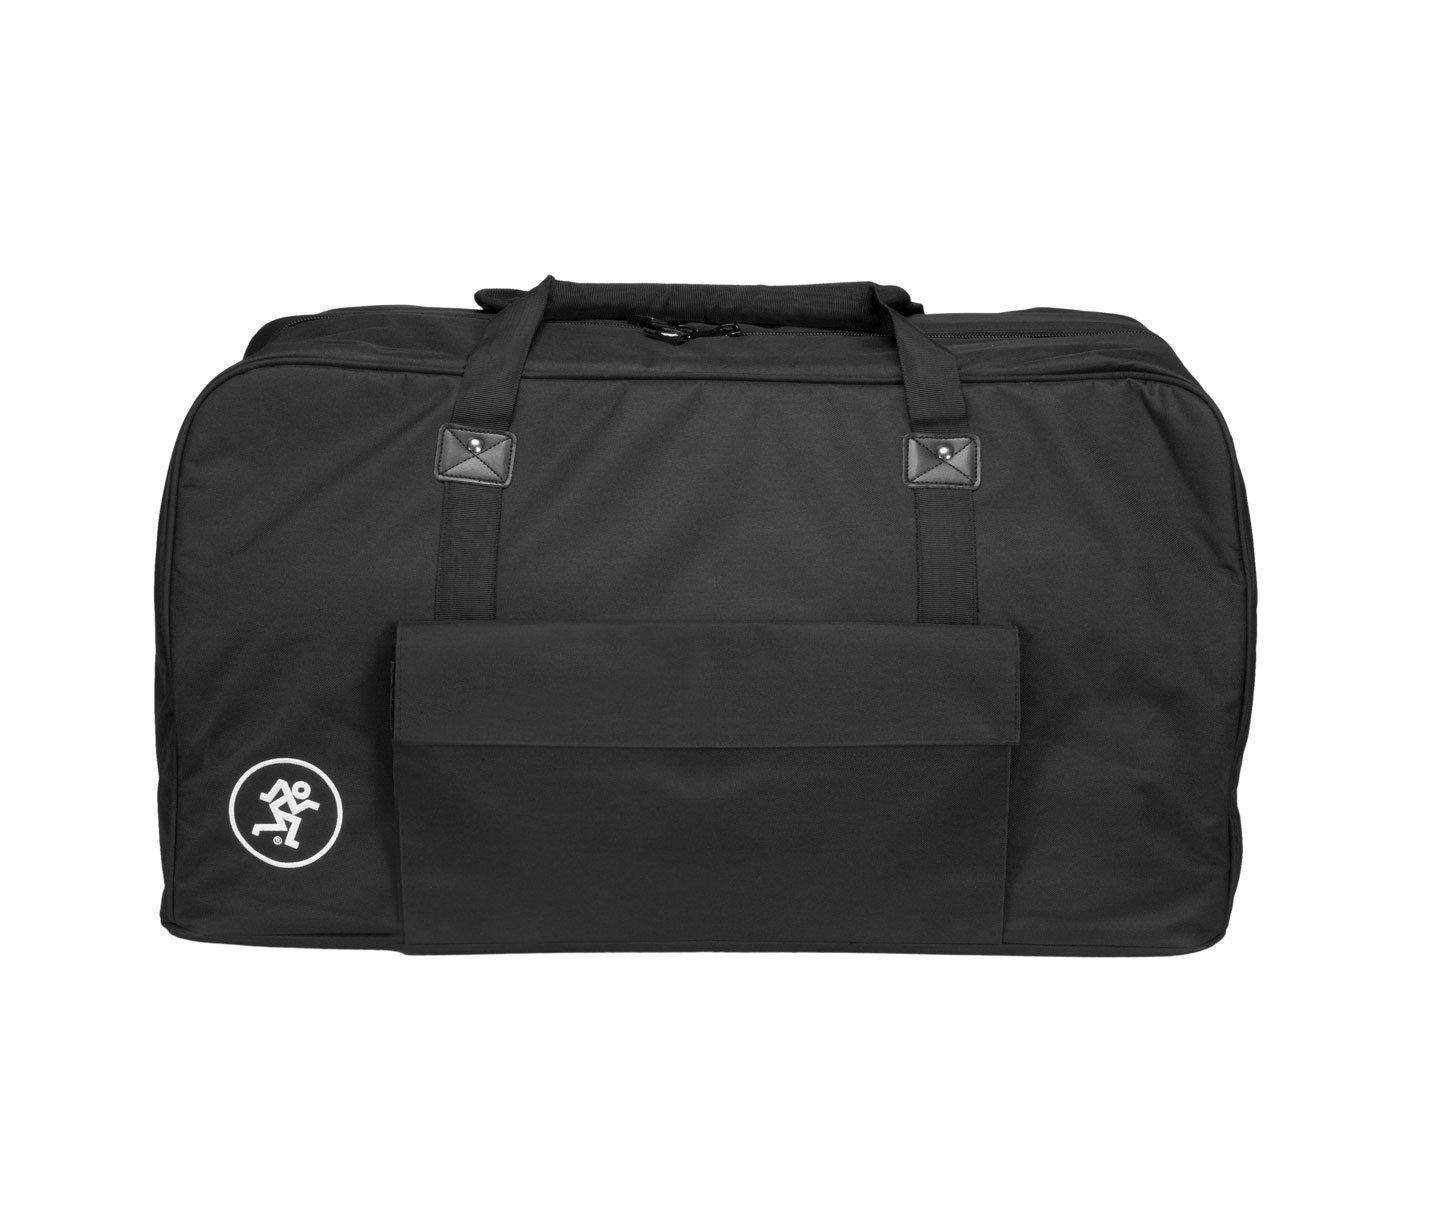 Mackie Speaker Bag for TH-12A (TH-12A Bag) Loud Technologies Inc.